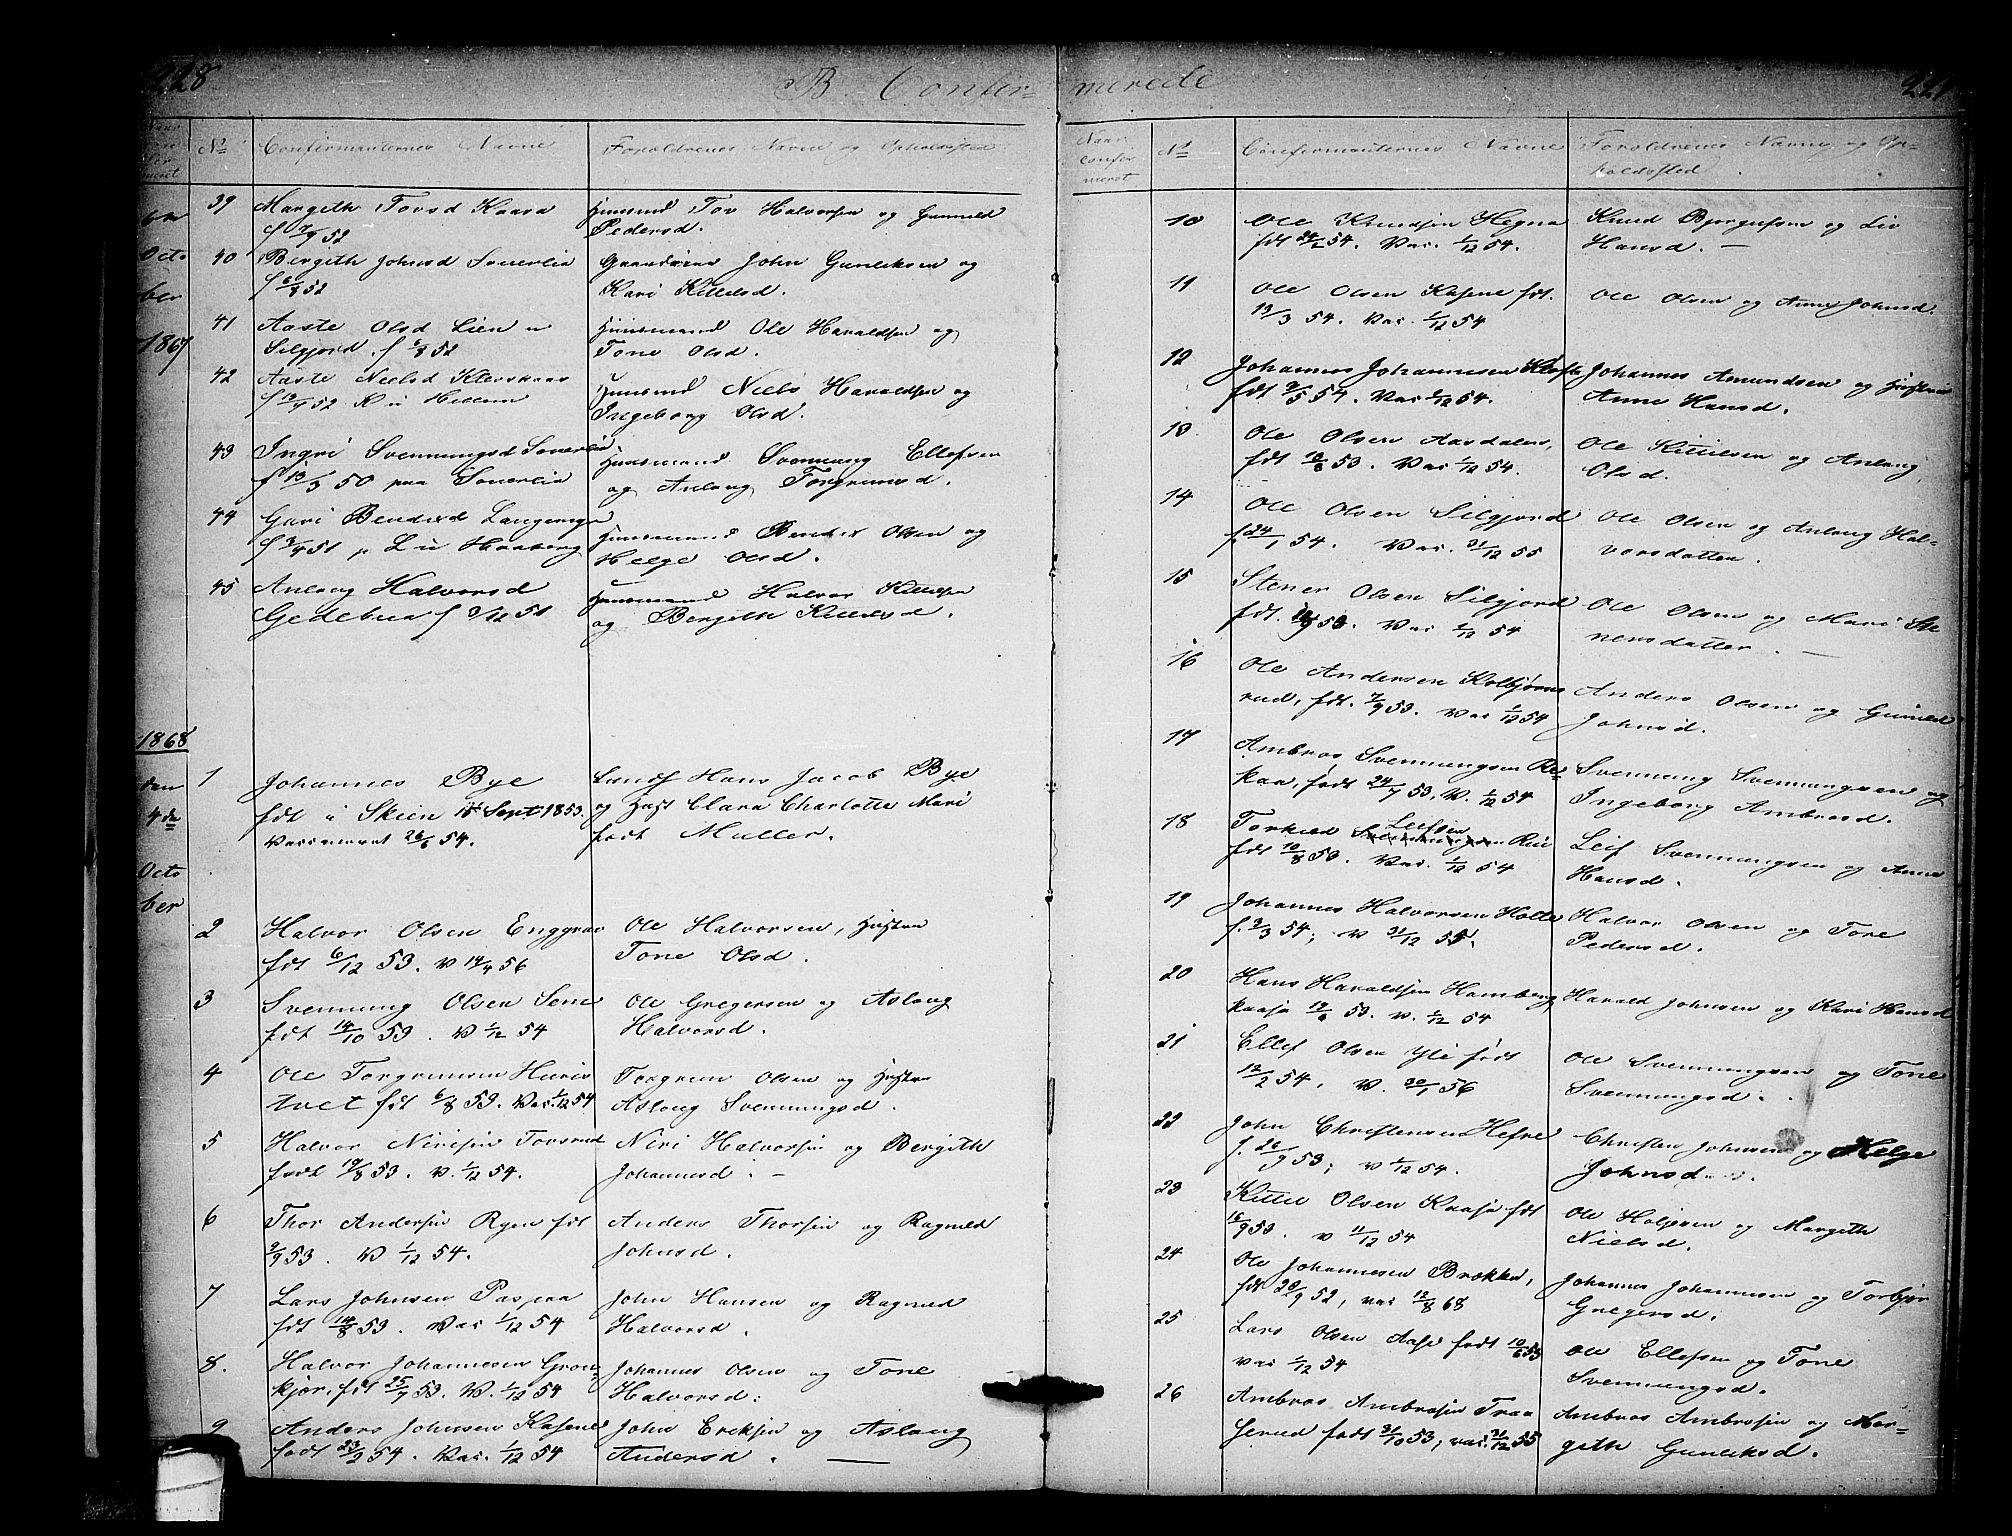 SAKO, Heddal kirkebøker, G/Ga/L0001: Klokkerbok nr. I 1, 1866-1878, s. 228-229